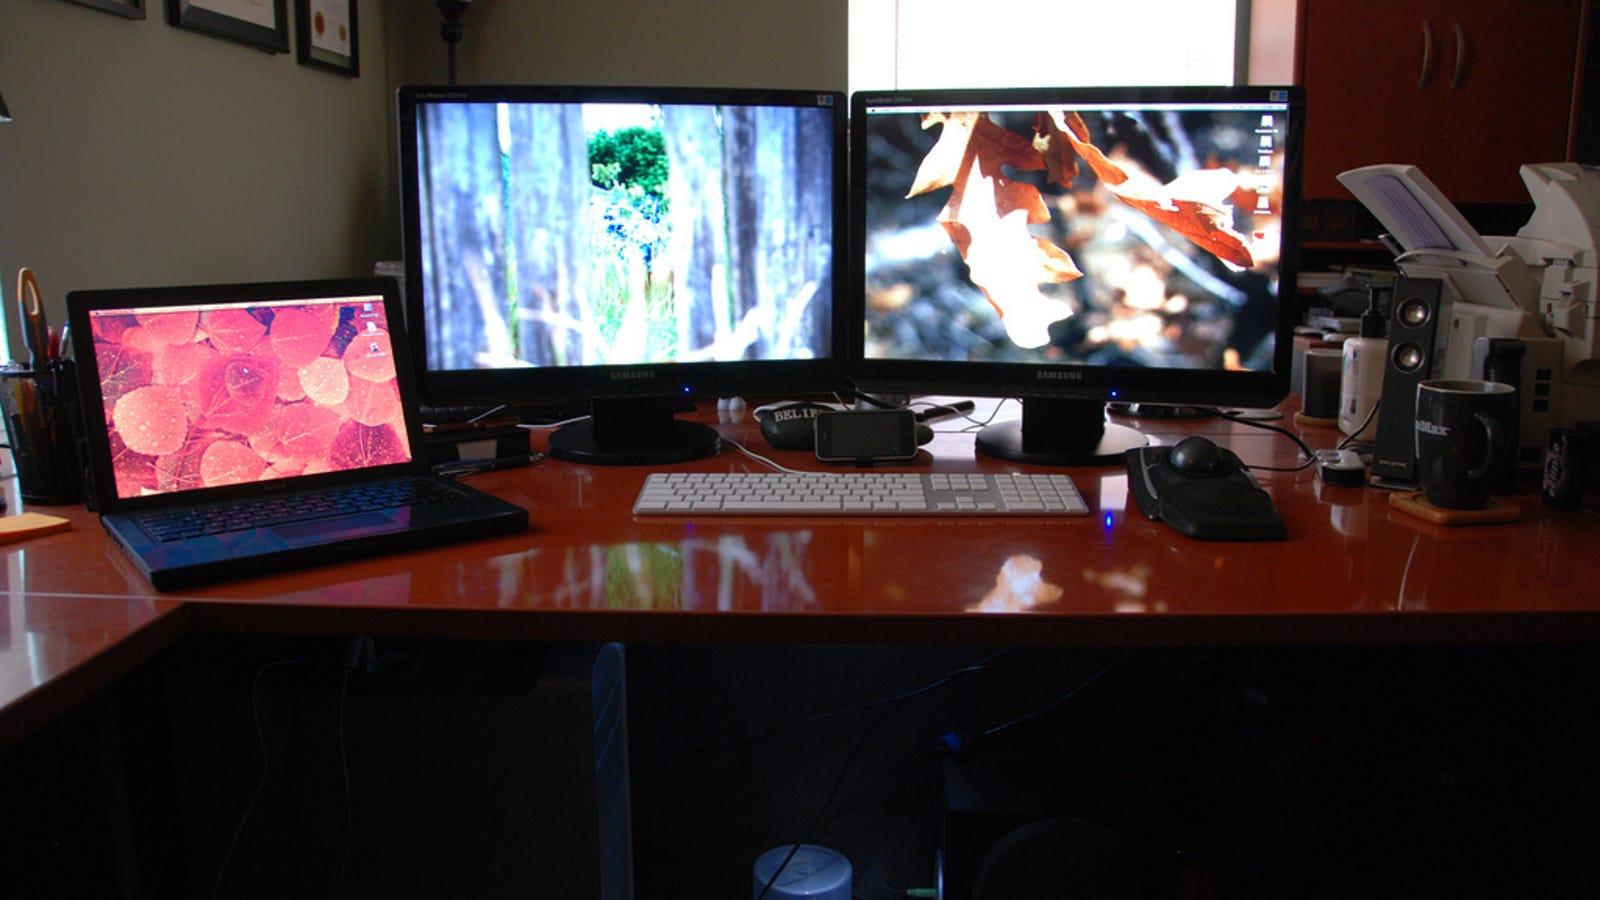 Home Office Dual Desk Setup: The Dual Workstation Home Office